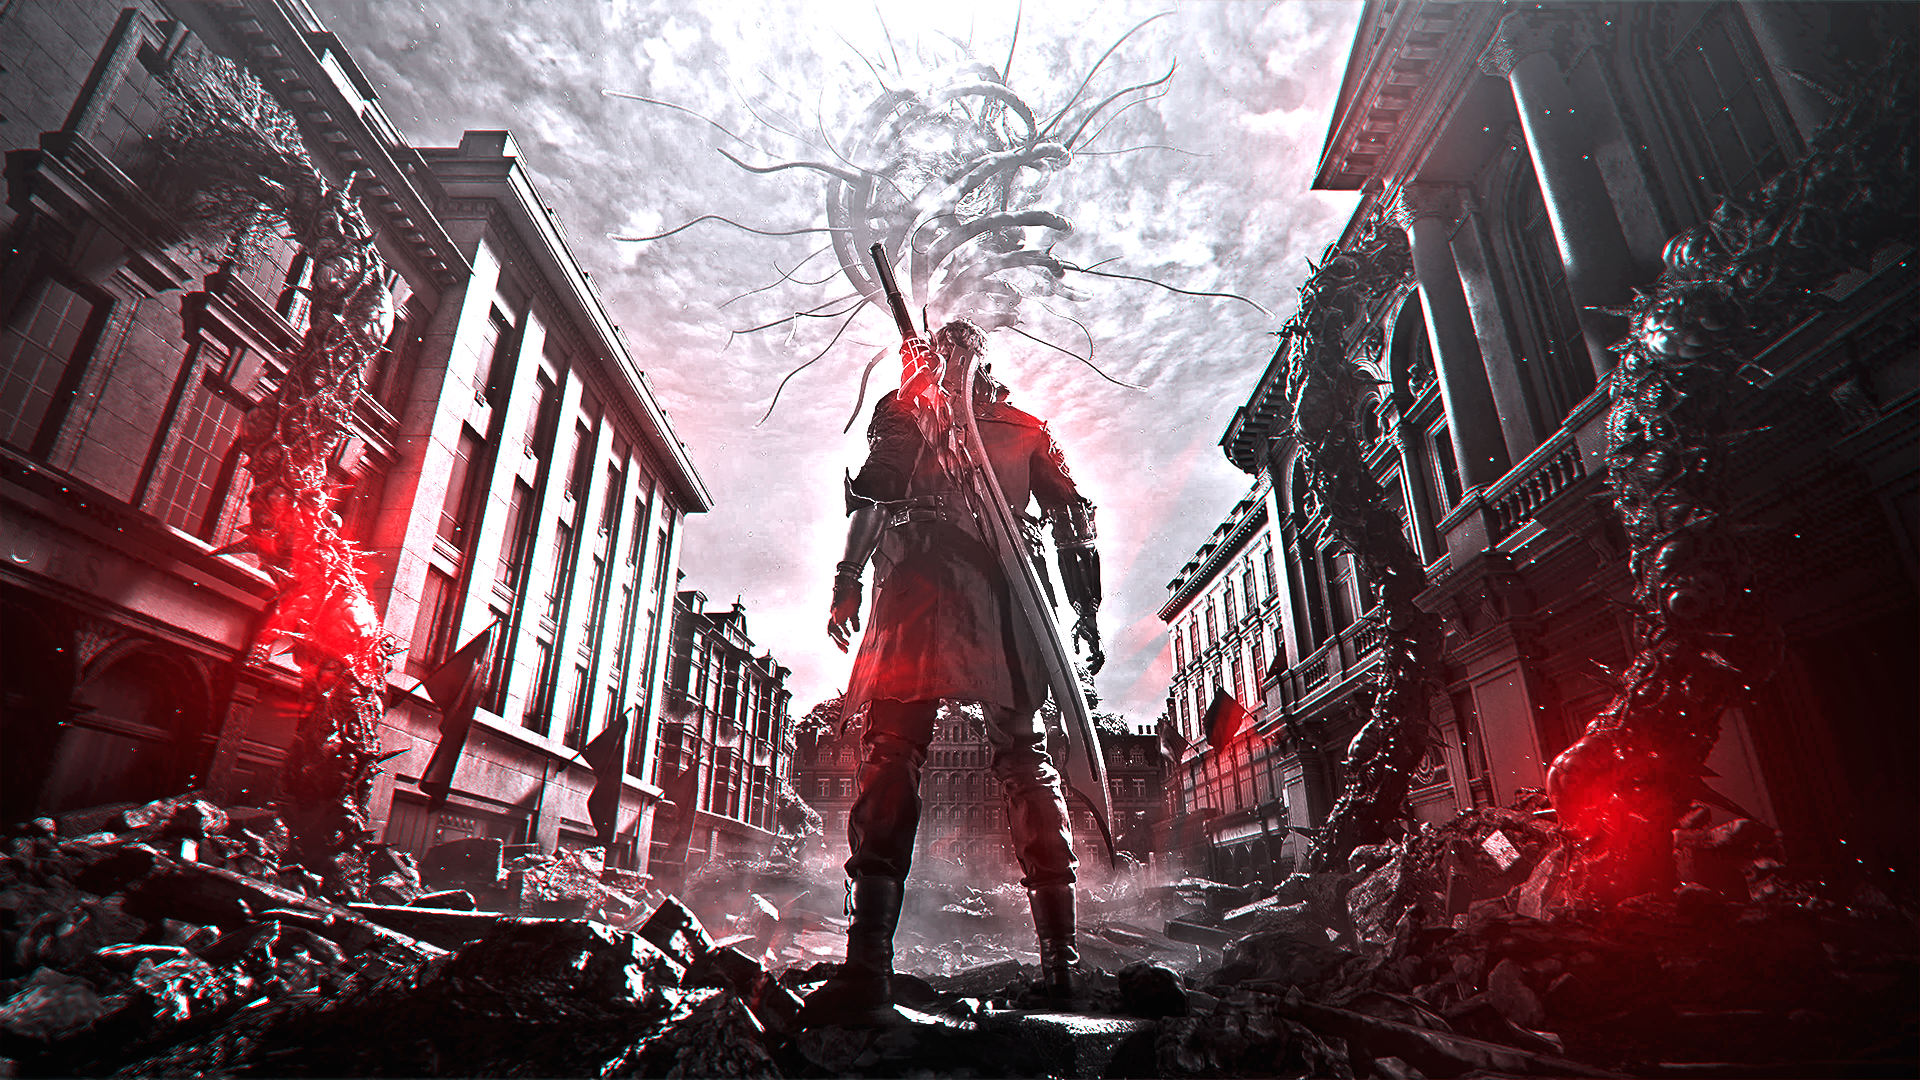 Devil May Cry 5 Wallpaper Edit By Sir R34 On Deviantart